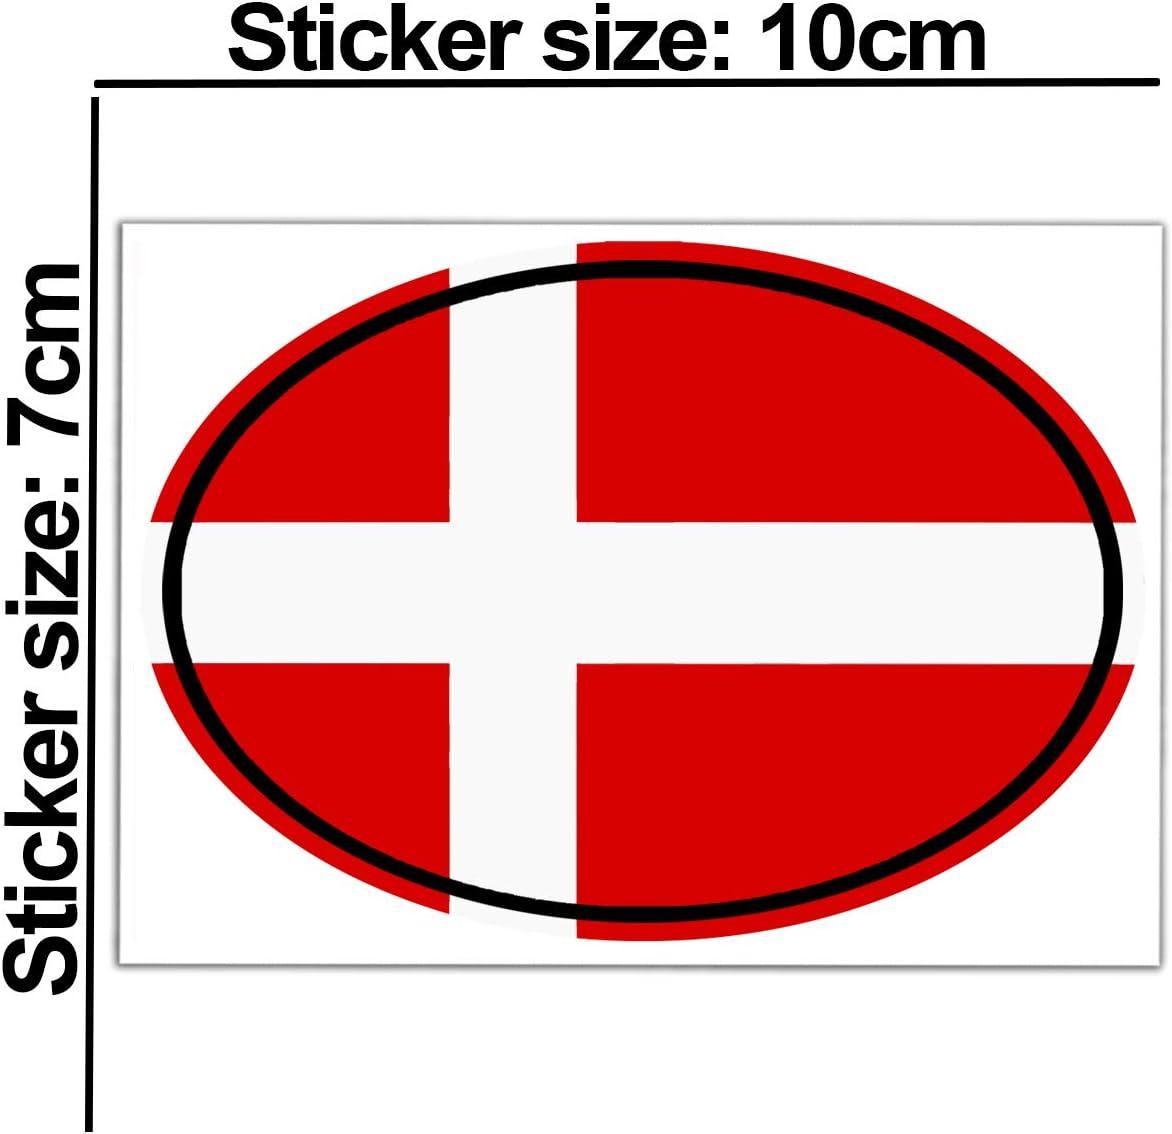 Biomar Labs 2 Stück Vinyl Dänemark Denmark Flagge Aufkleber Autoaufkleber Stickers Auto Moto Motorrad Fahrrad Helm Fenster Tuning B 193 Auto